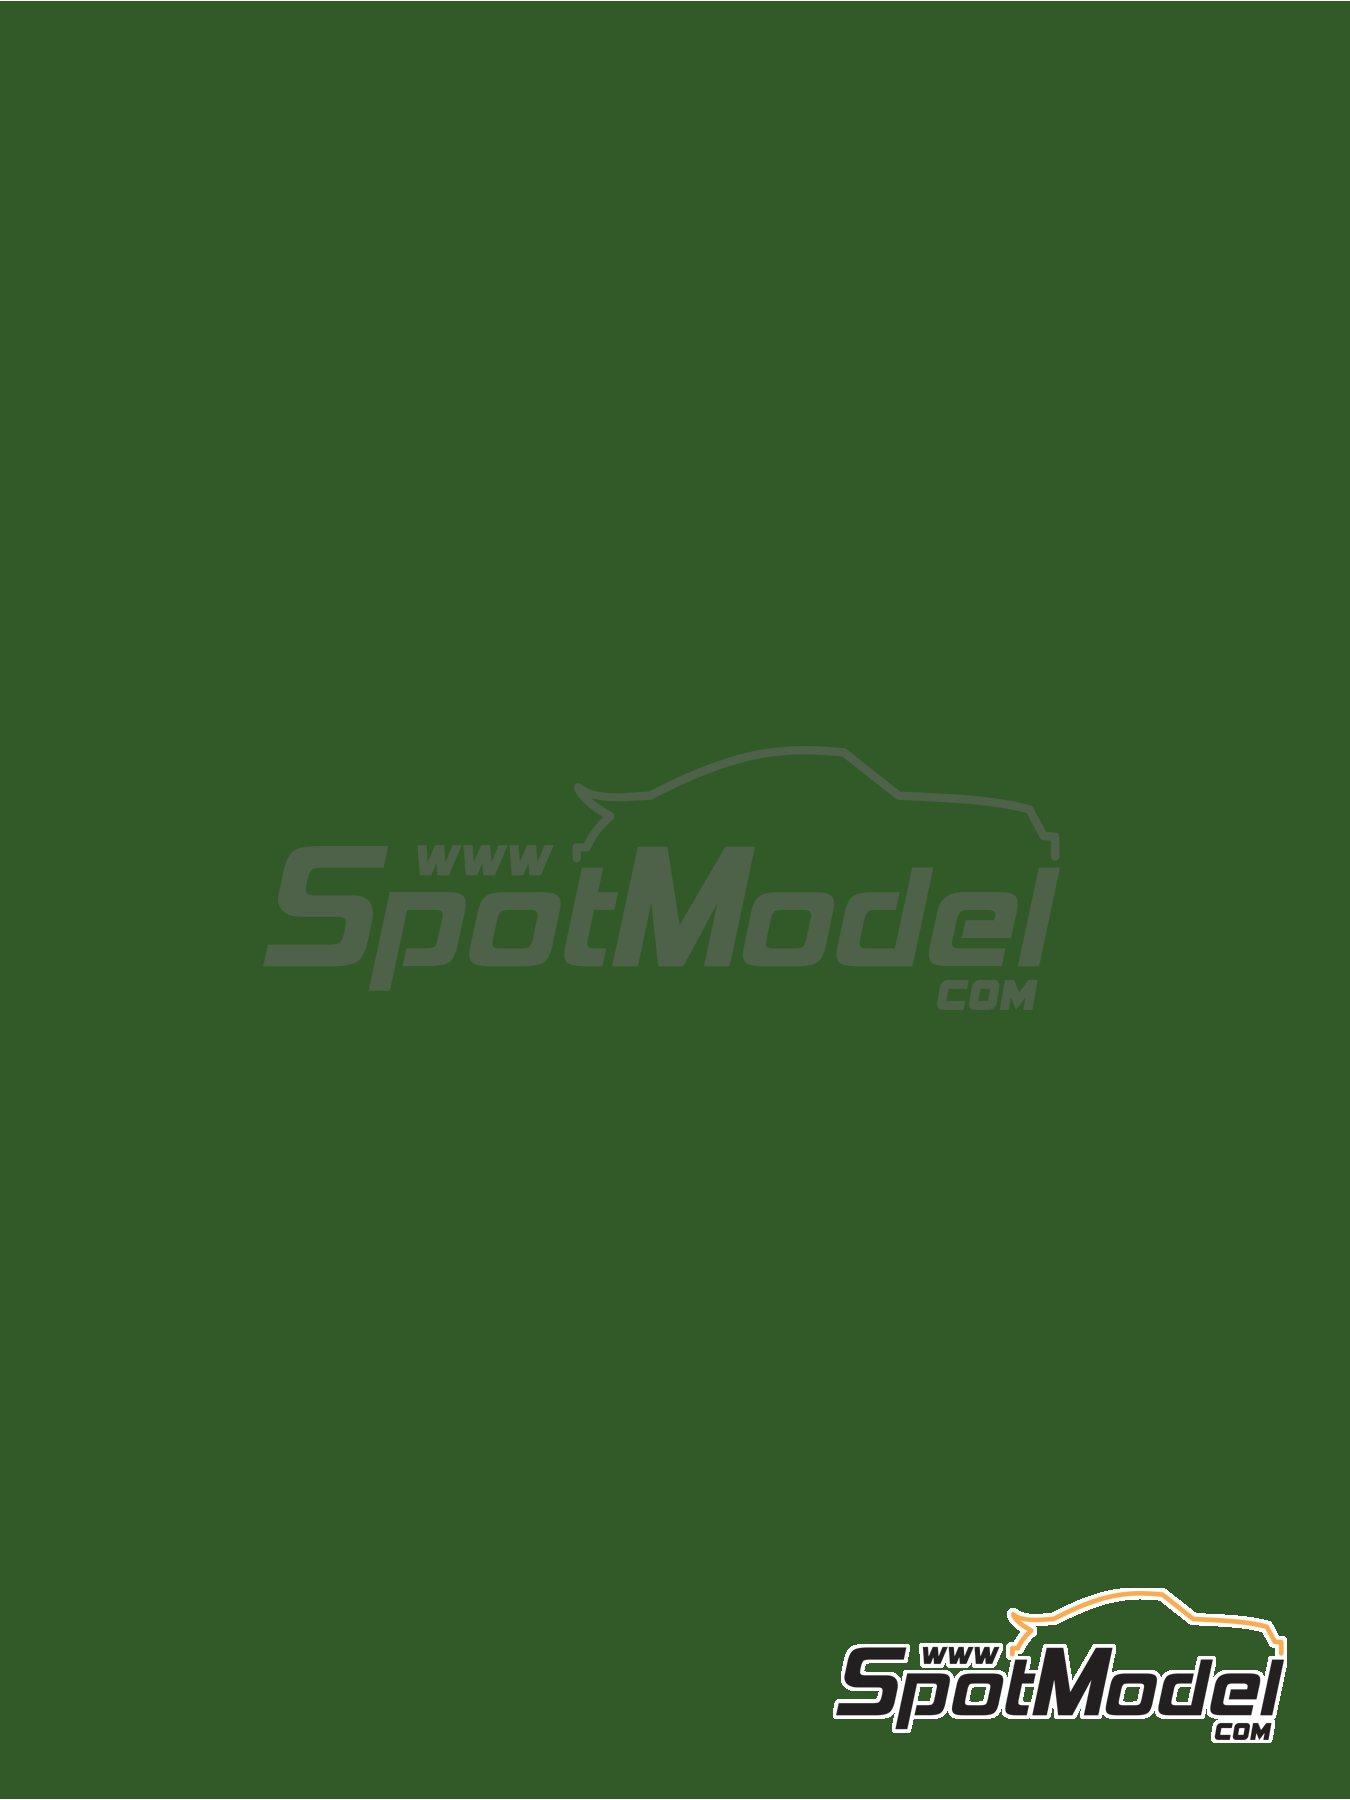 Verde hoja - RAL6002 - Leaf green - 1 x 60ml | Pintura fabricado por Zero Paints (ref.ZP-1033-RAL6002) image